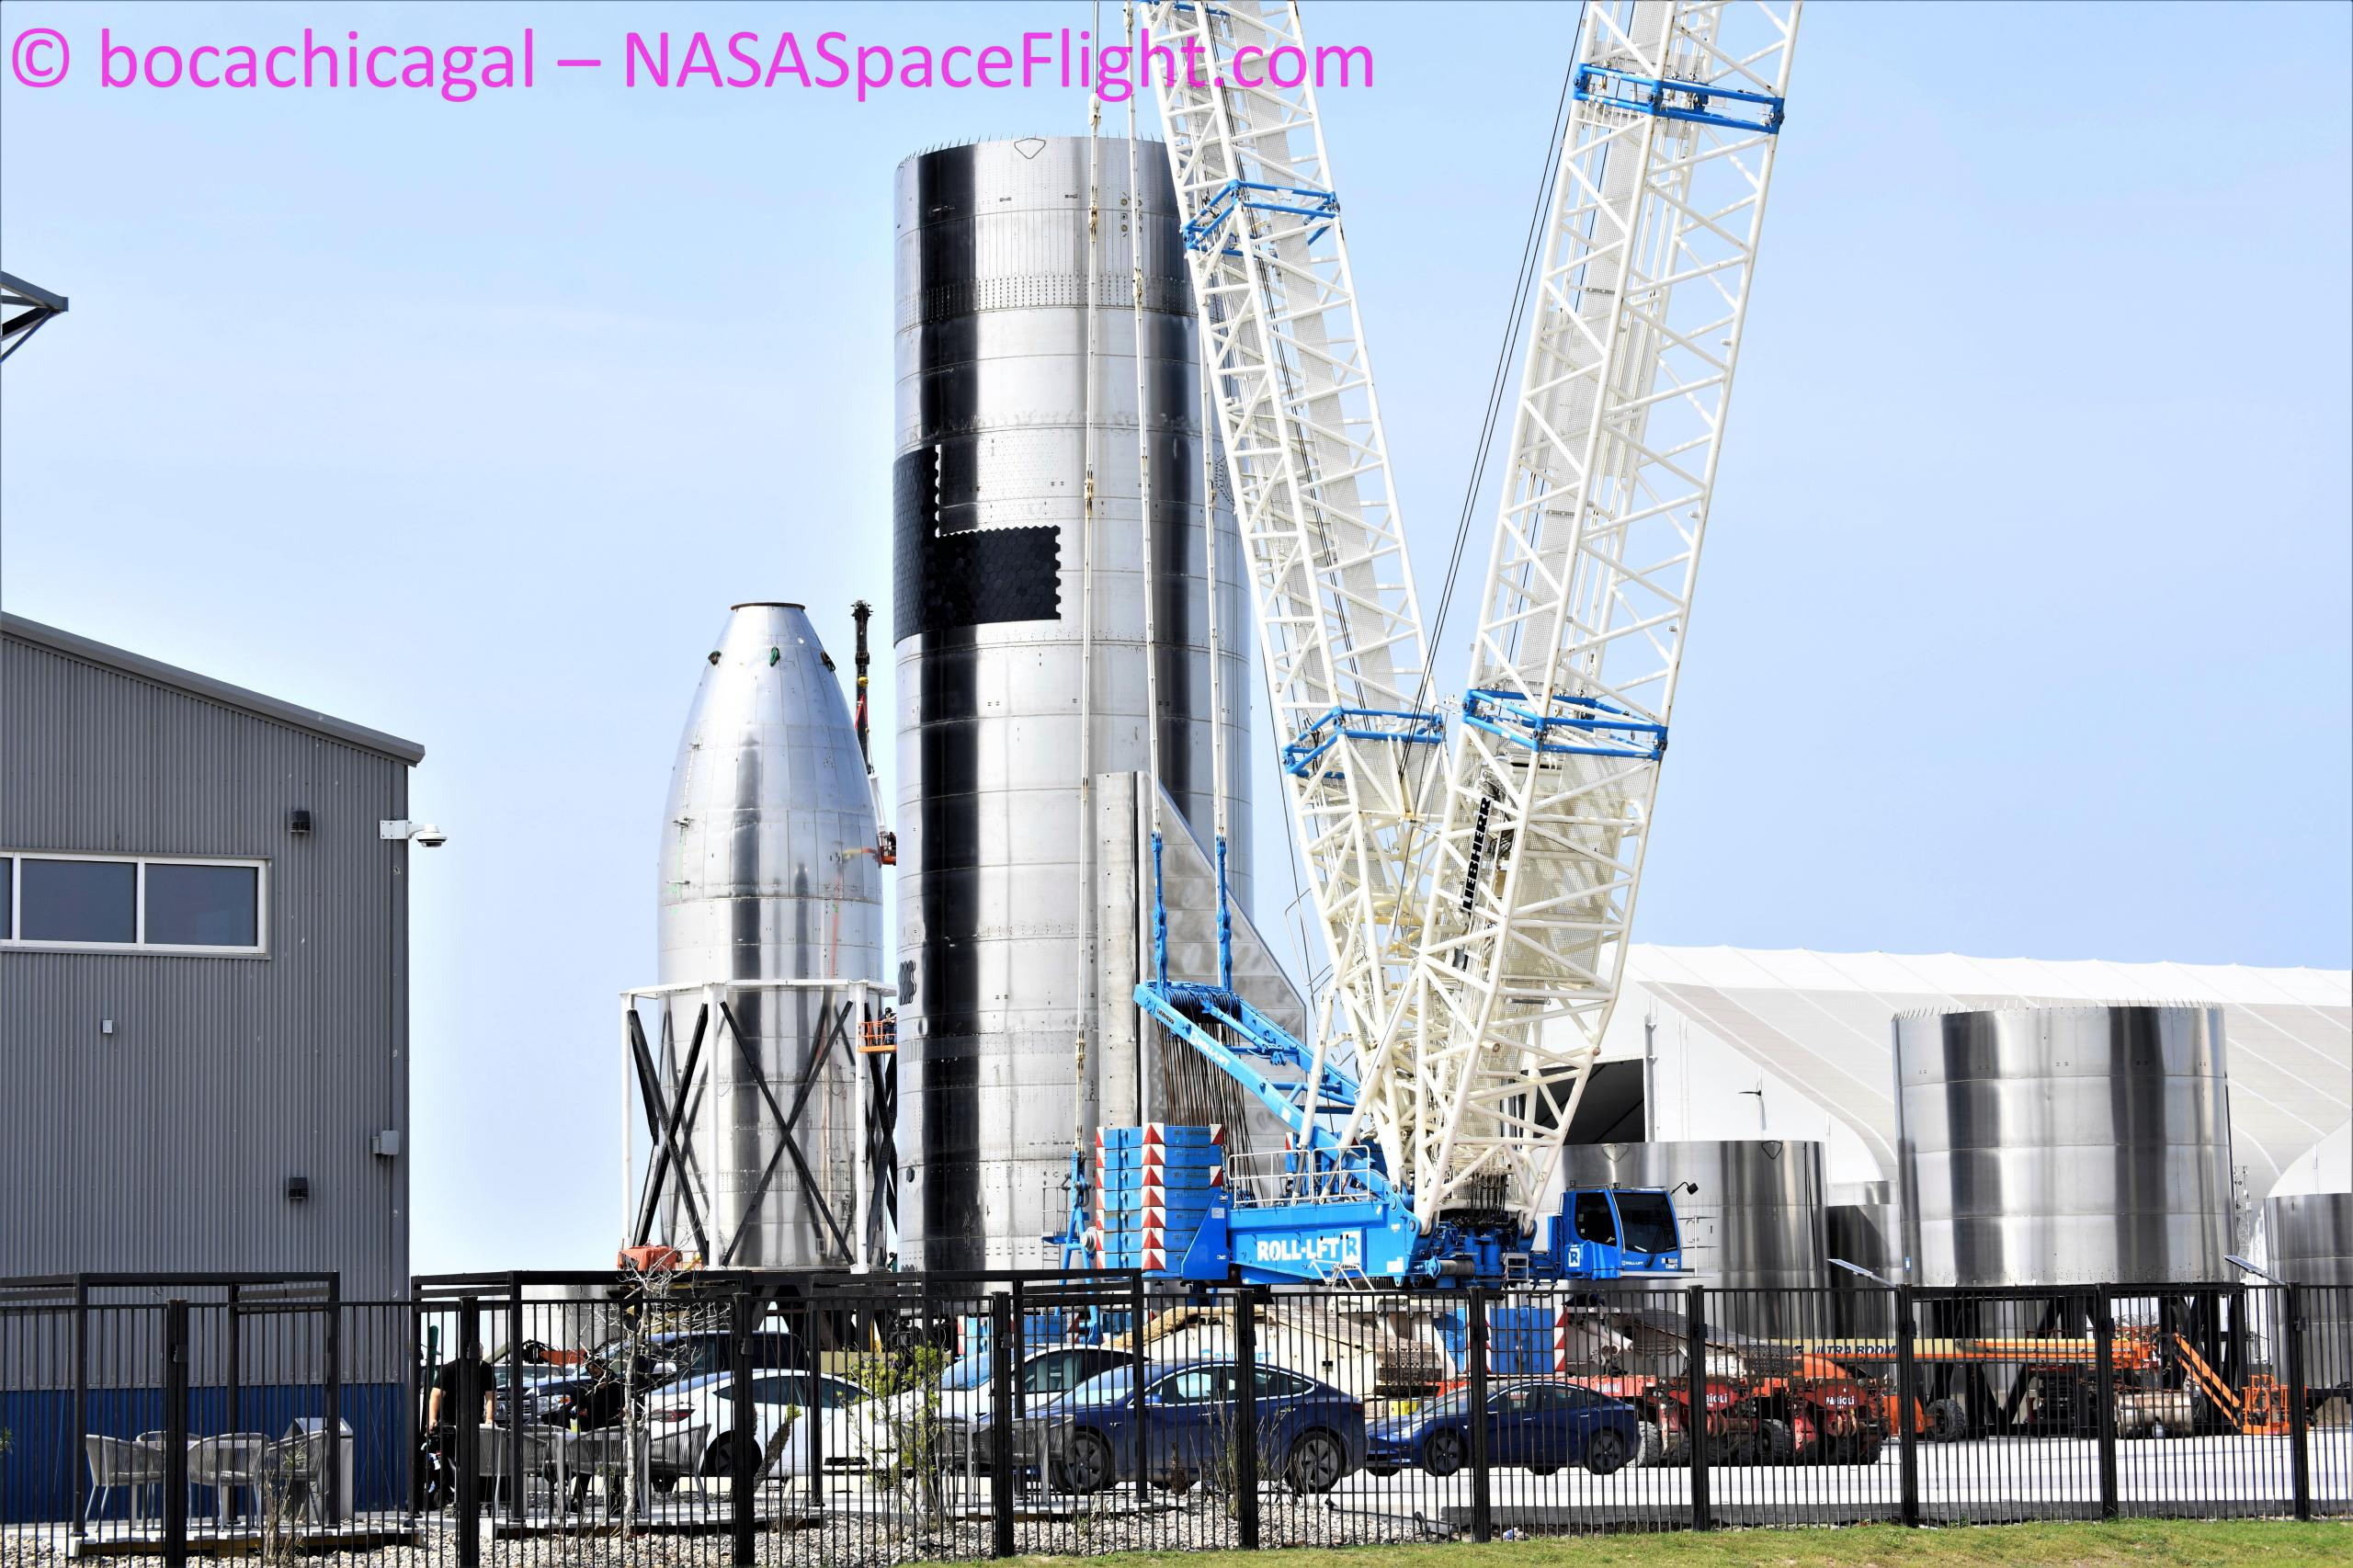 Starship Boca Chica 033121 (NASASpaceflight – bocachicagal) SN15 high bay move 2 (c)